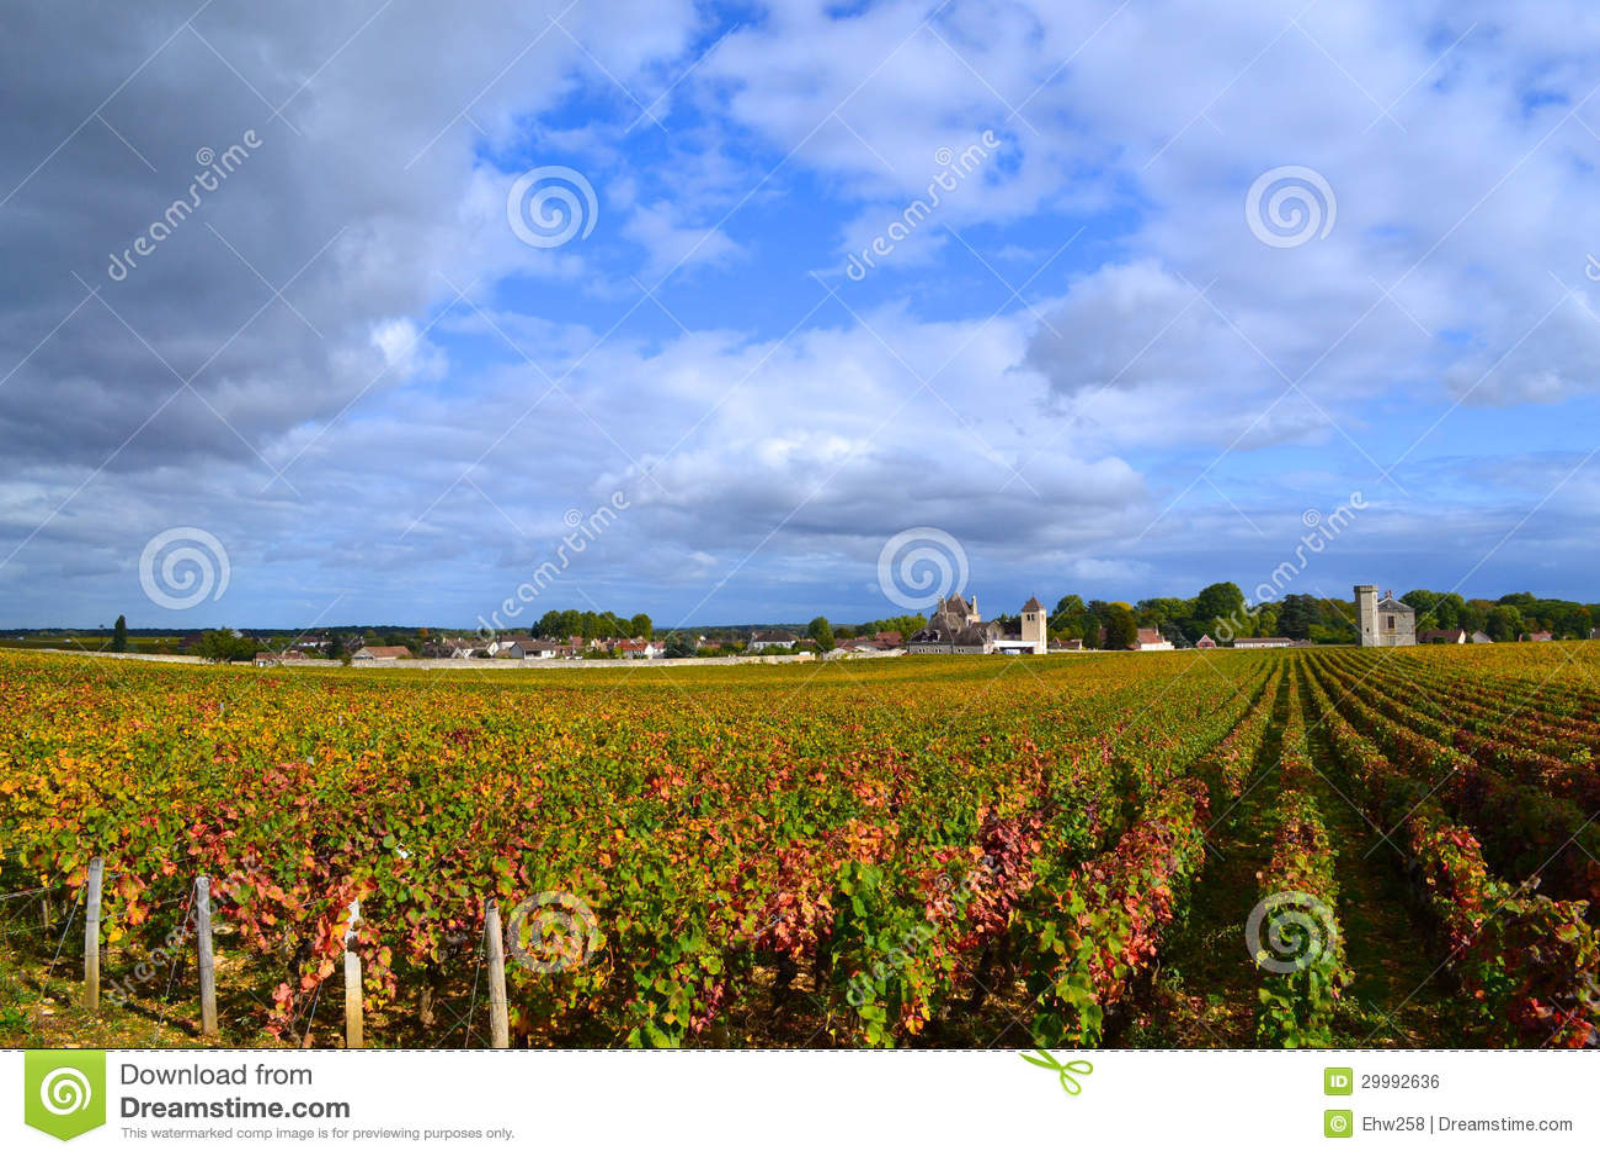 Vineyard burgundy france royalty free stock image 29992636 - The splendid transformation of a vineyard in burgundy ...